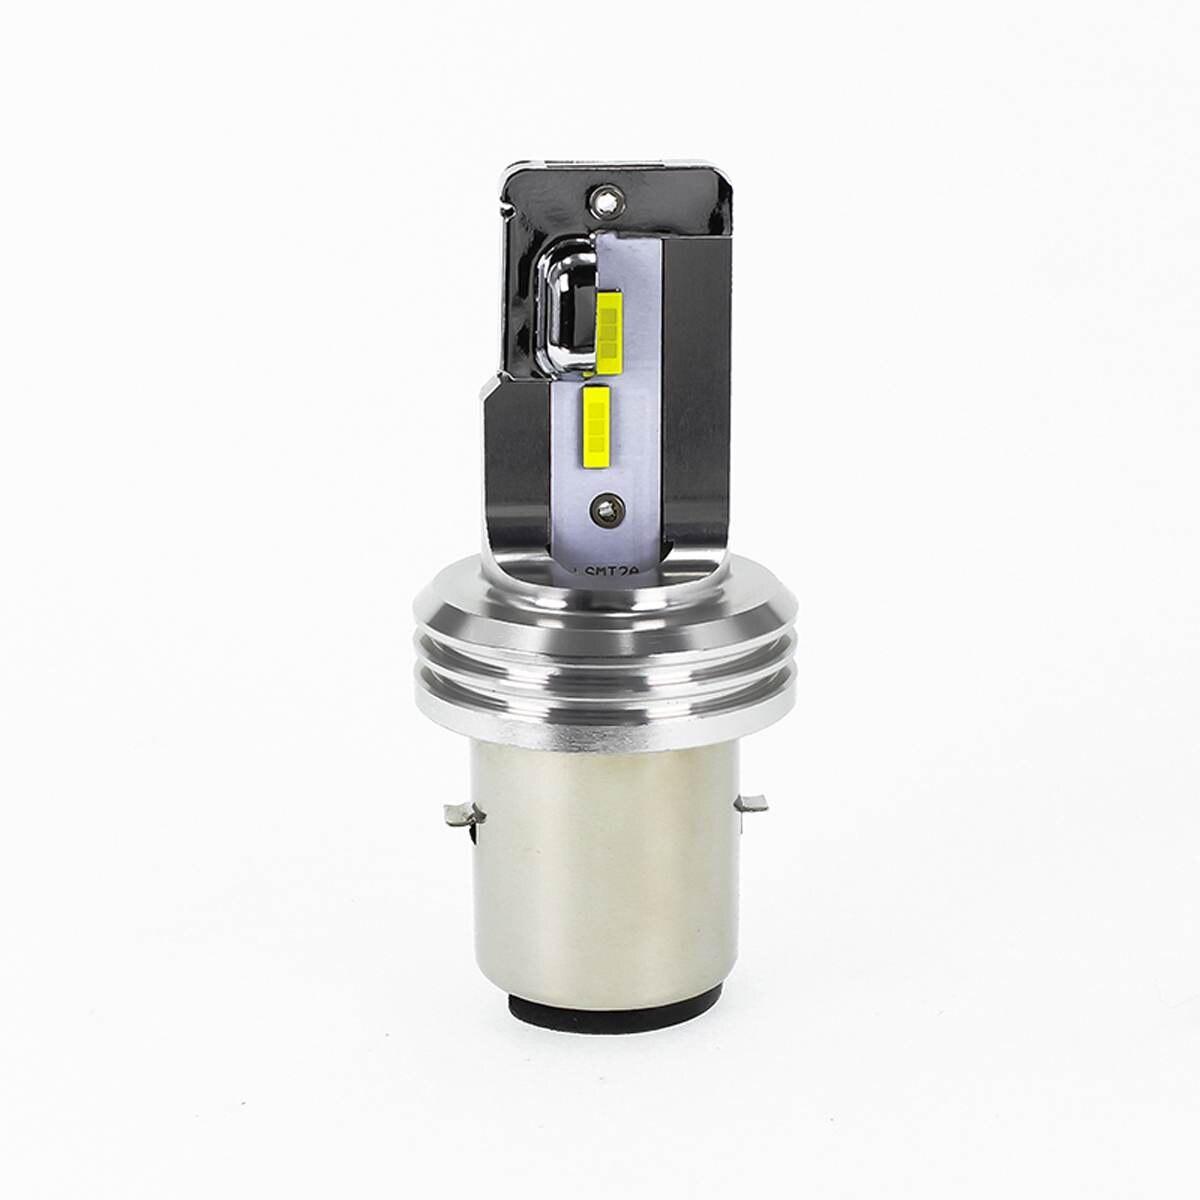 1x 18W 1600LM LED Headlights Bulb H6 BA20D / H4 HS1 Hi/Low Beam 6000-6500K White Headlamp Super Bright MT2A Car LED Headlight